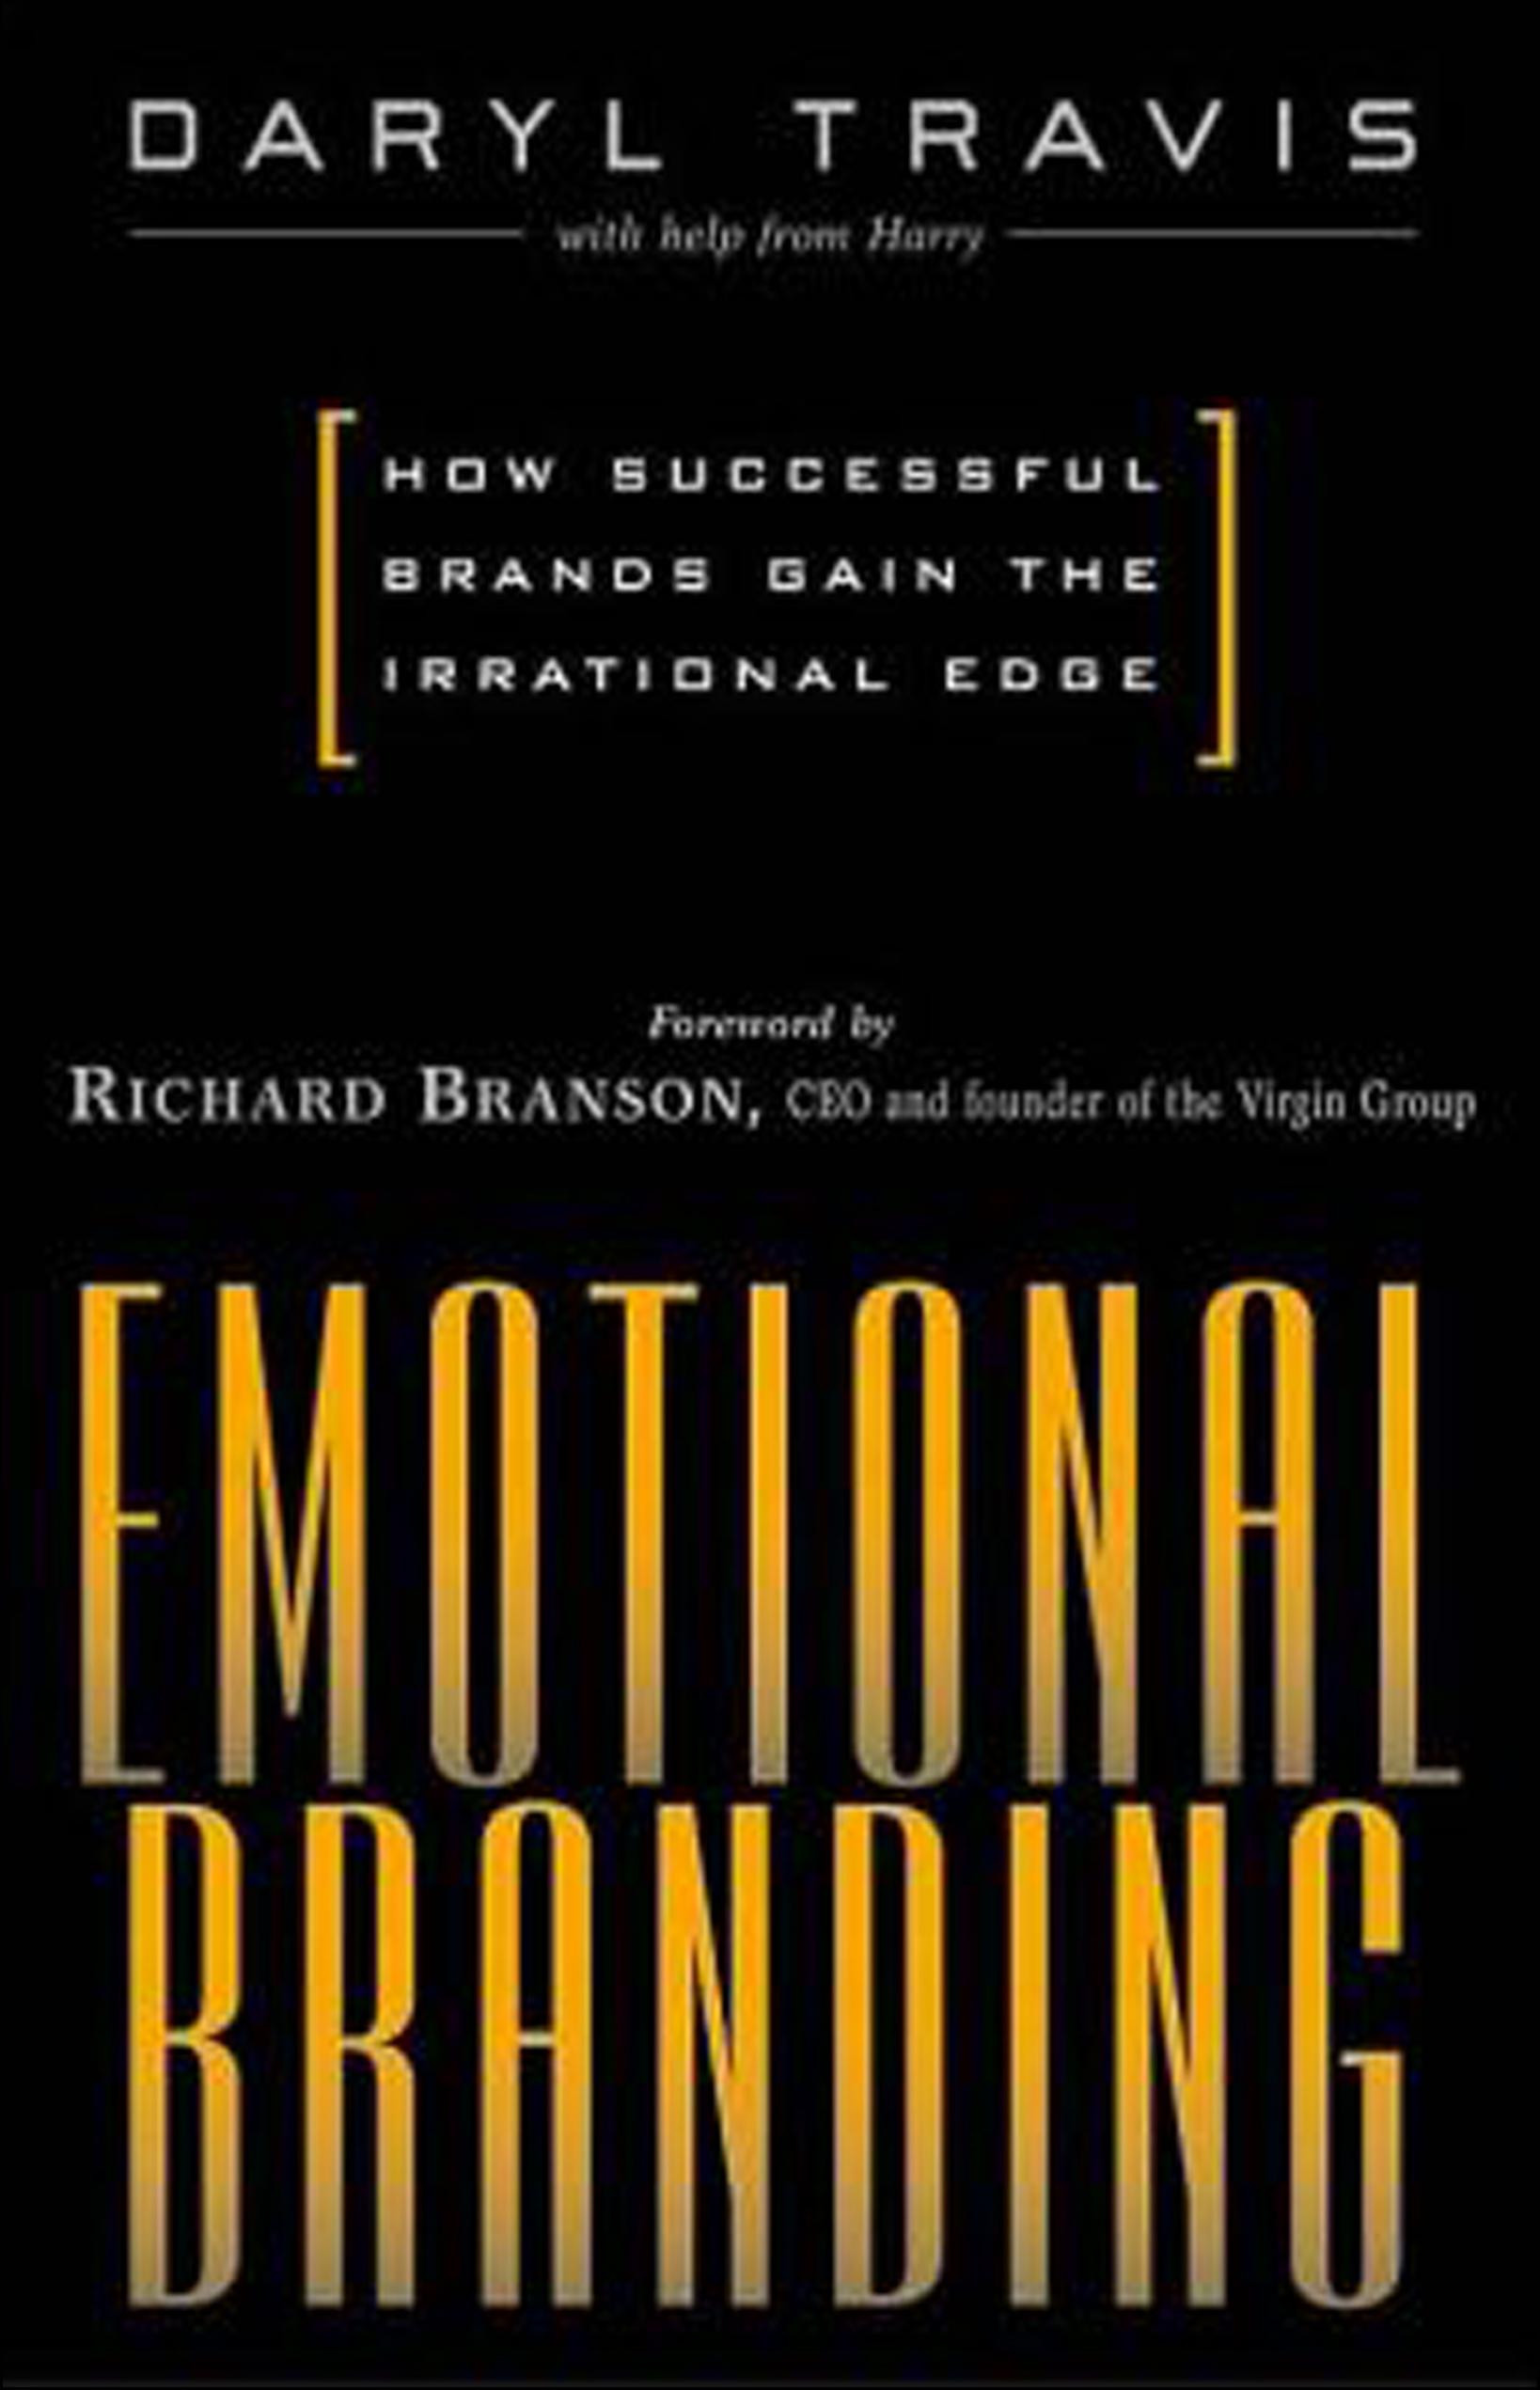 1. Emotional Branding.jpg